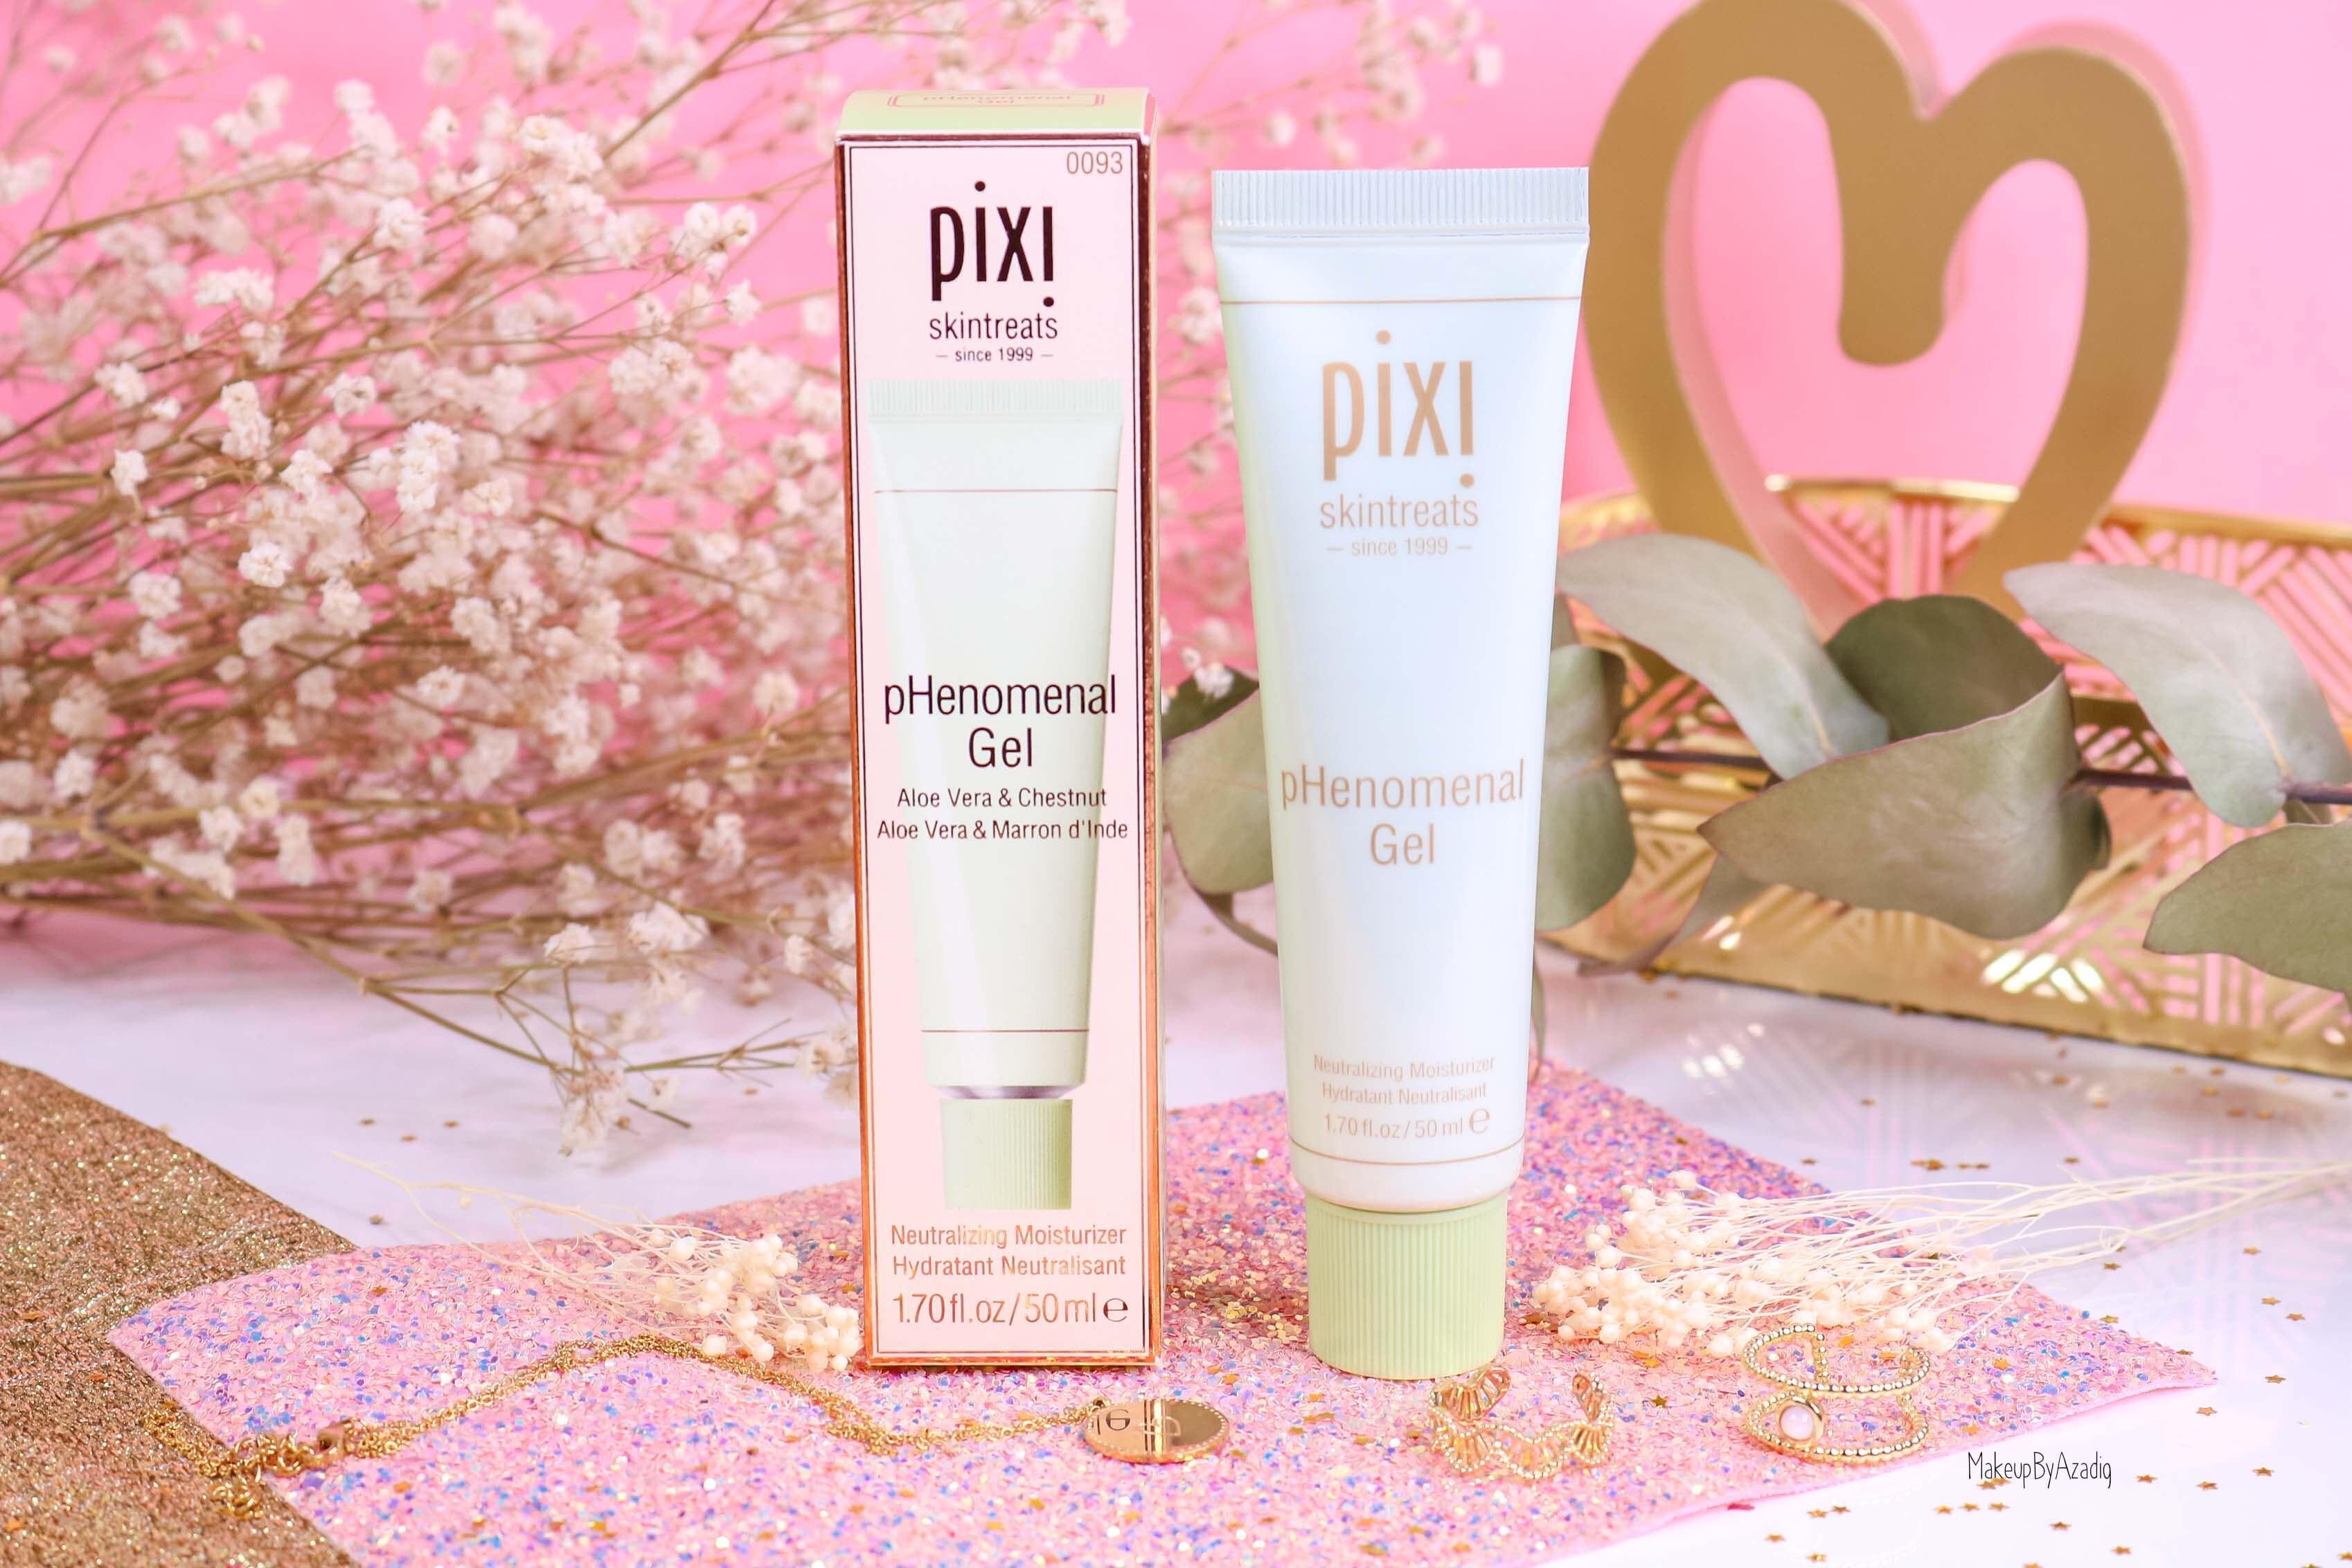 revue-routine-soin-skincare-pixi-beauty-visage-glow-tonic-serum-phenomenal-gel-aloe-vera-makeupbyazadig-sephora-avis-prix-chestnut